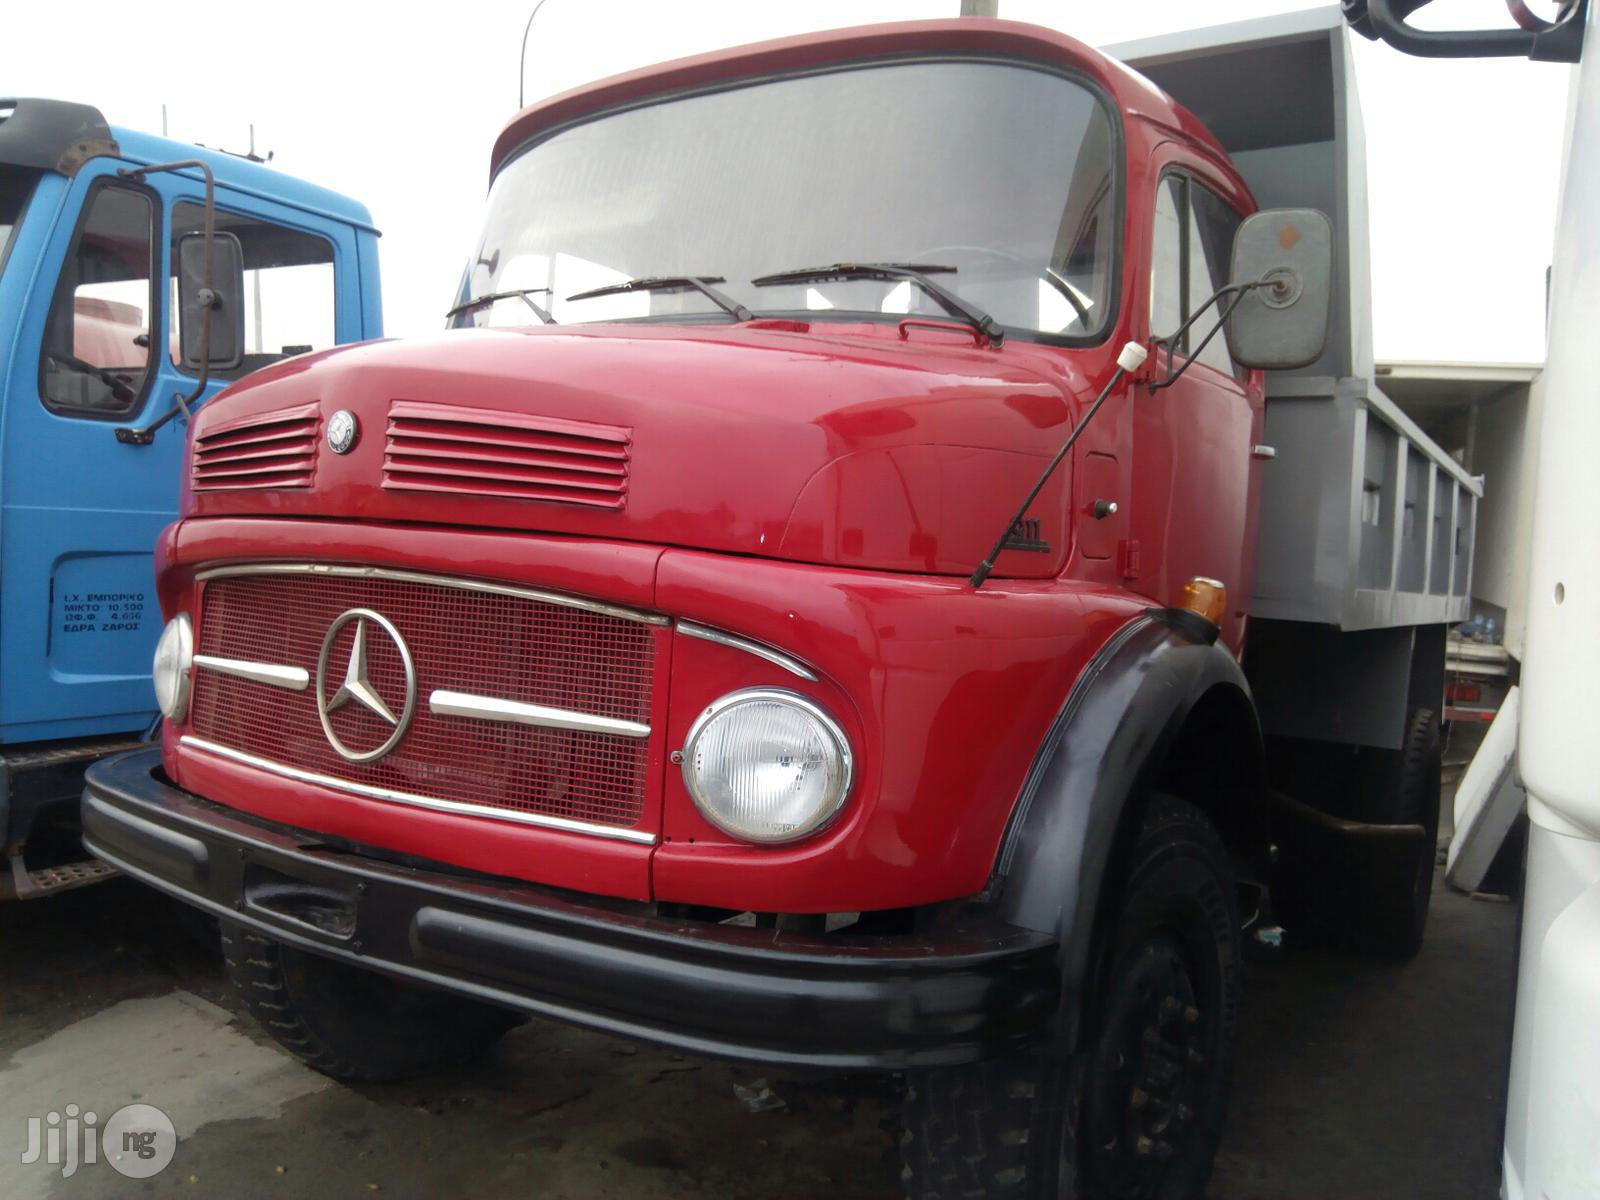 Mercedes Benz Tipper 1988 | Trucks & Trailers for sale in Apapa, Lagos State, Nigeria